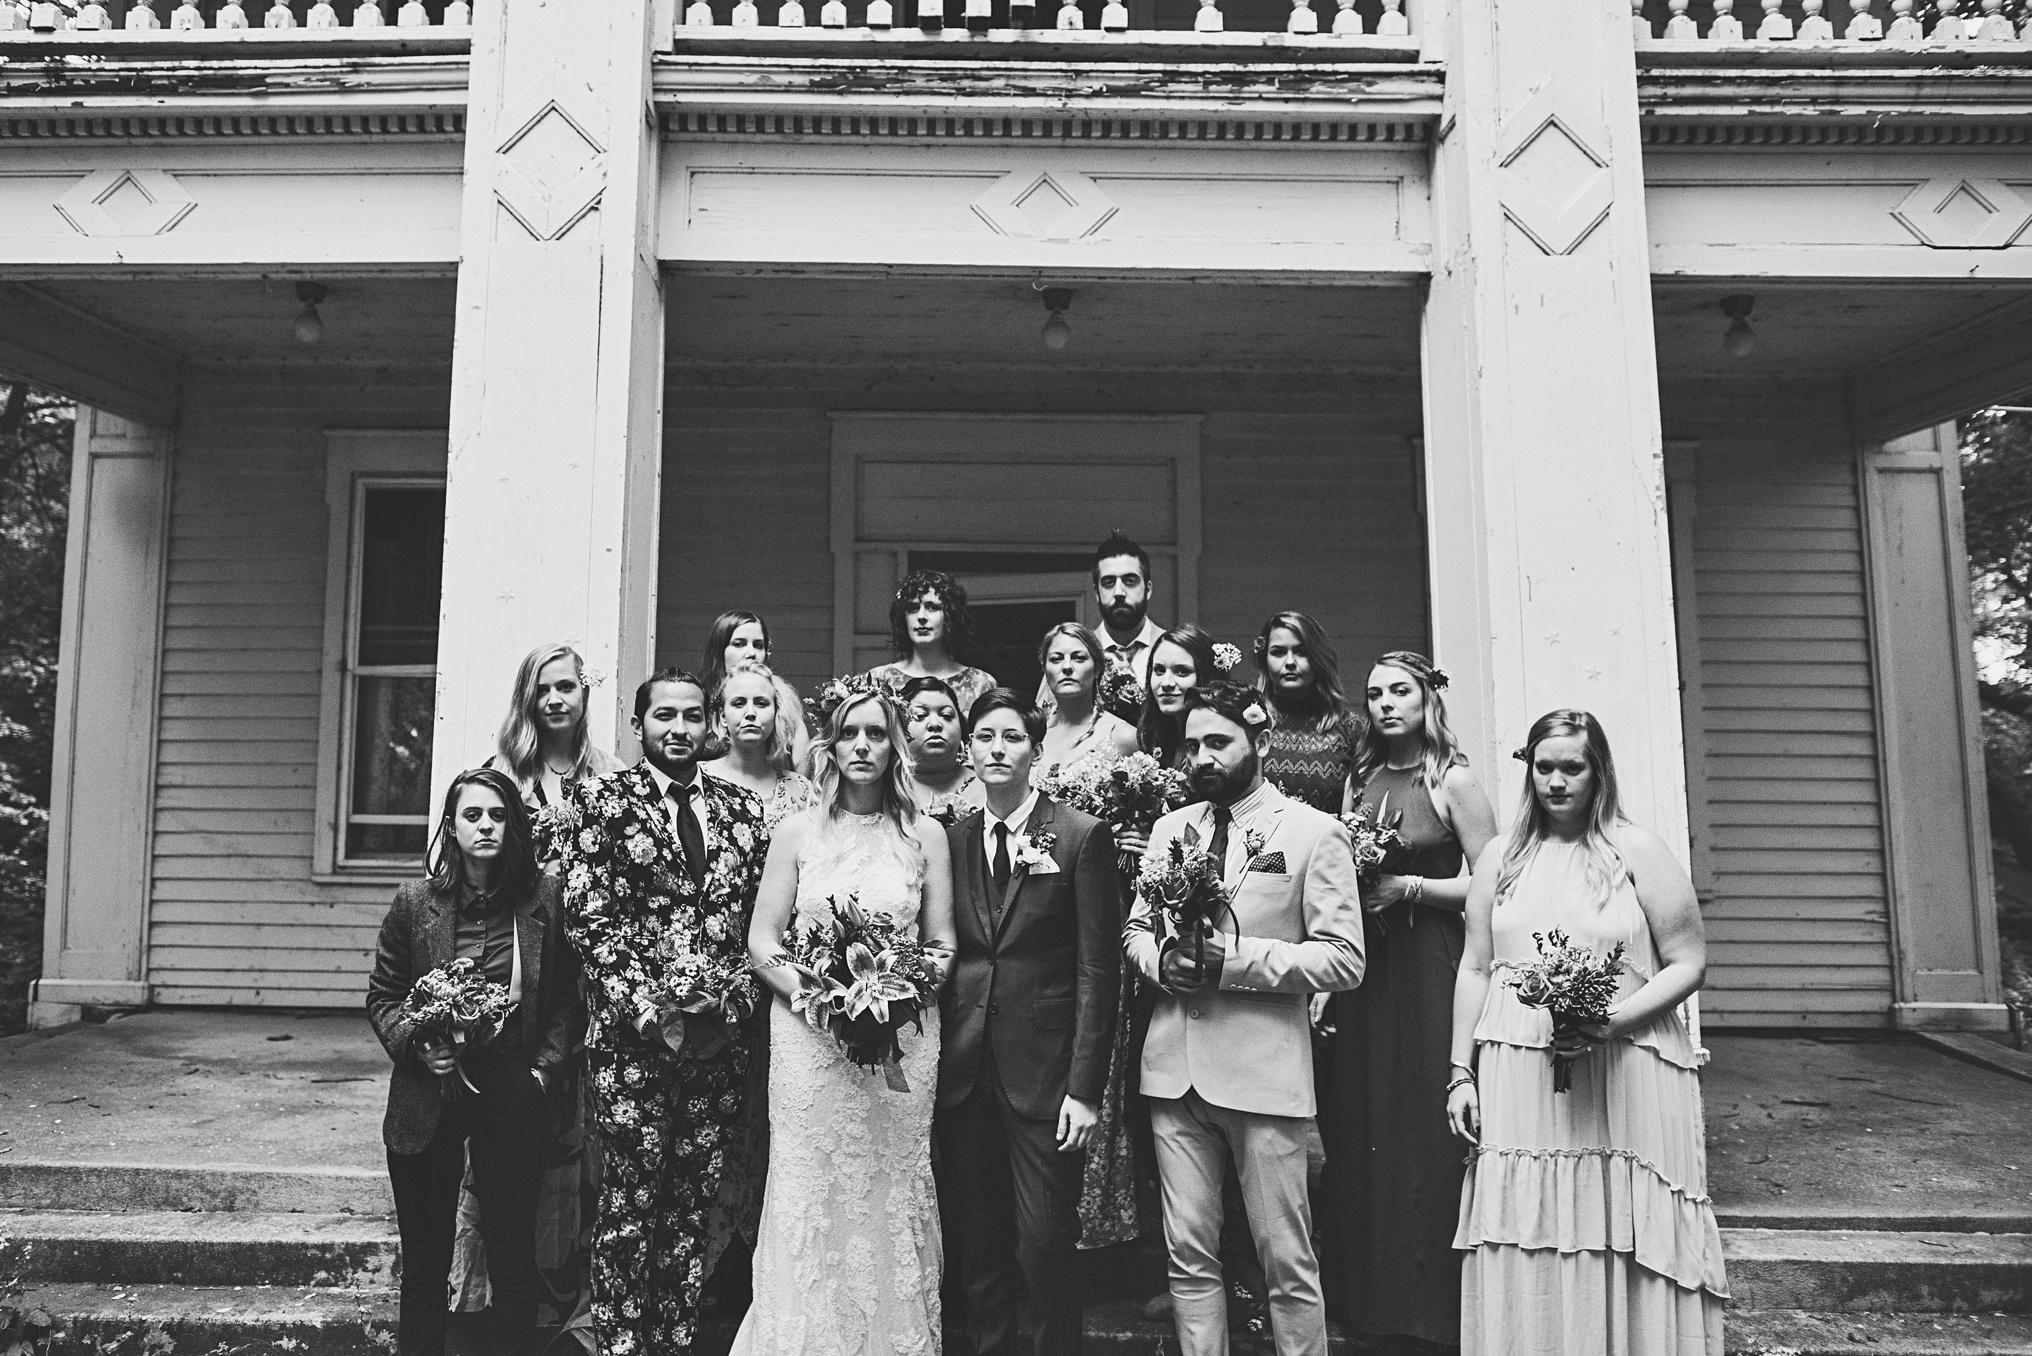 best_wedding_photography_2017_by_lucas_botz_photography_095.jpg